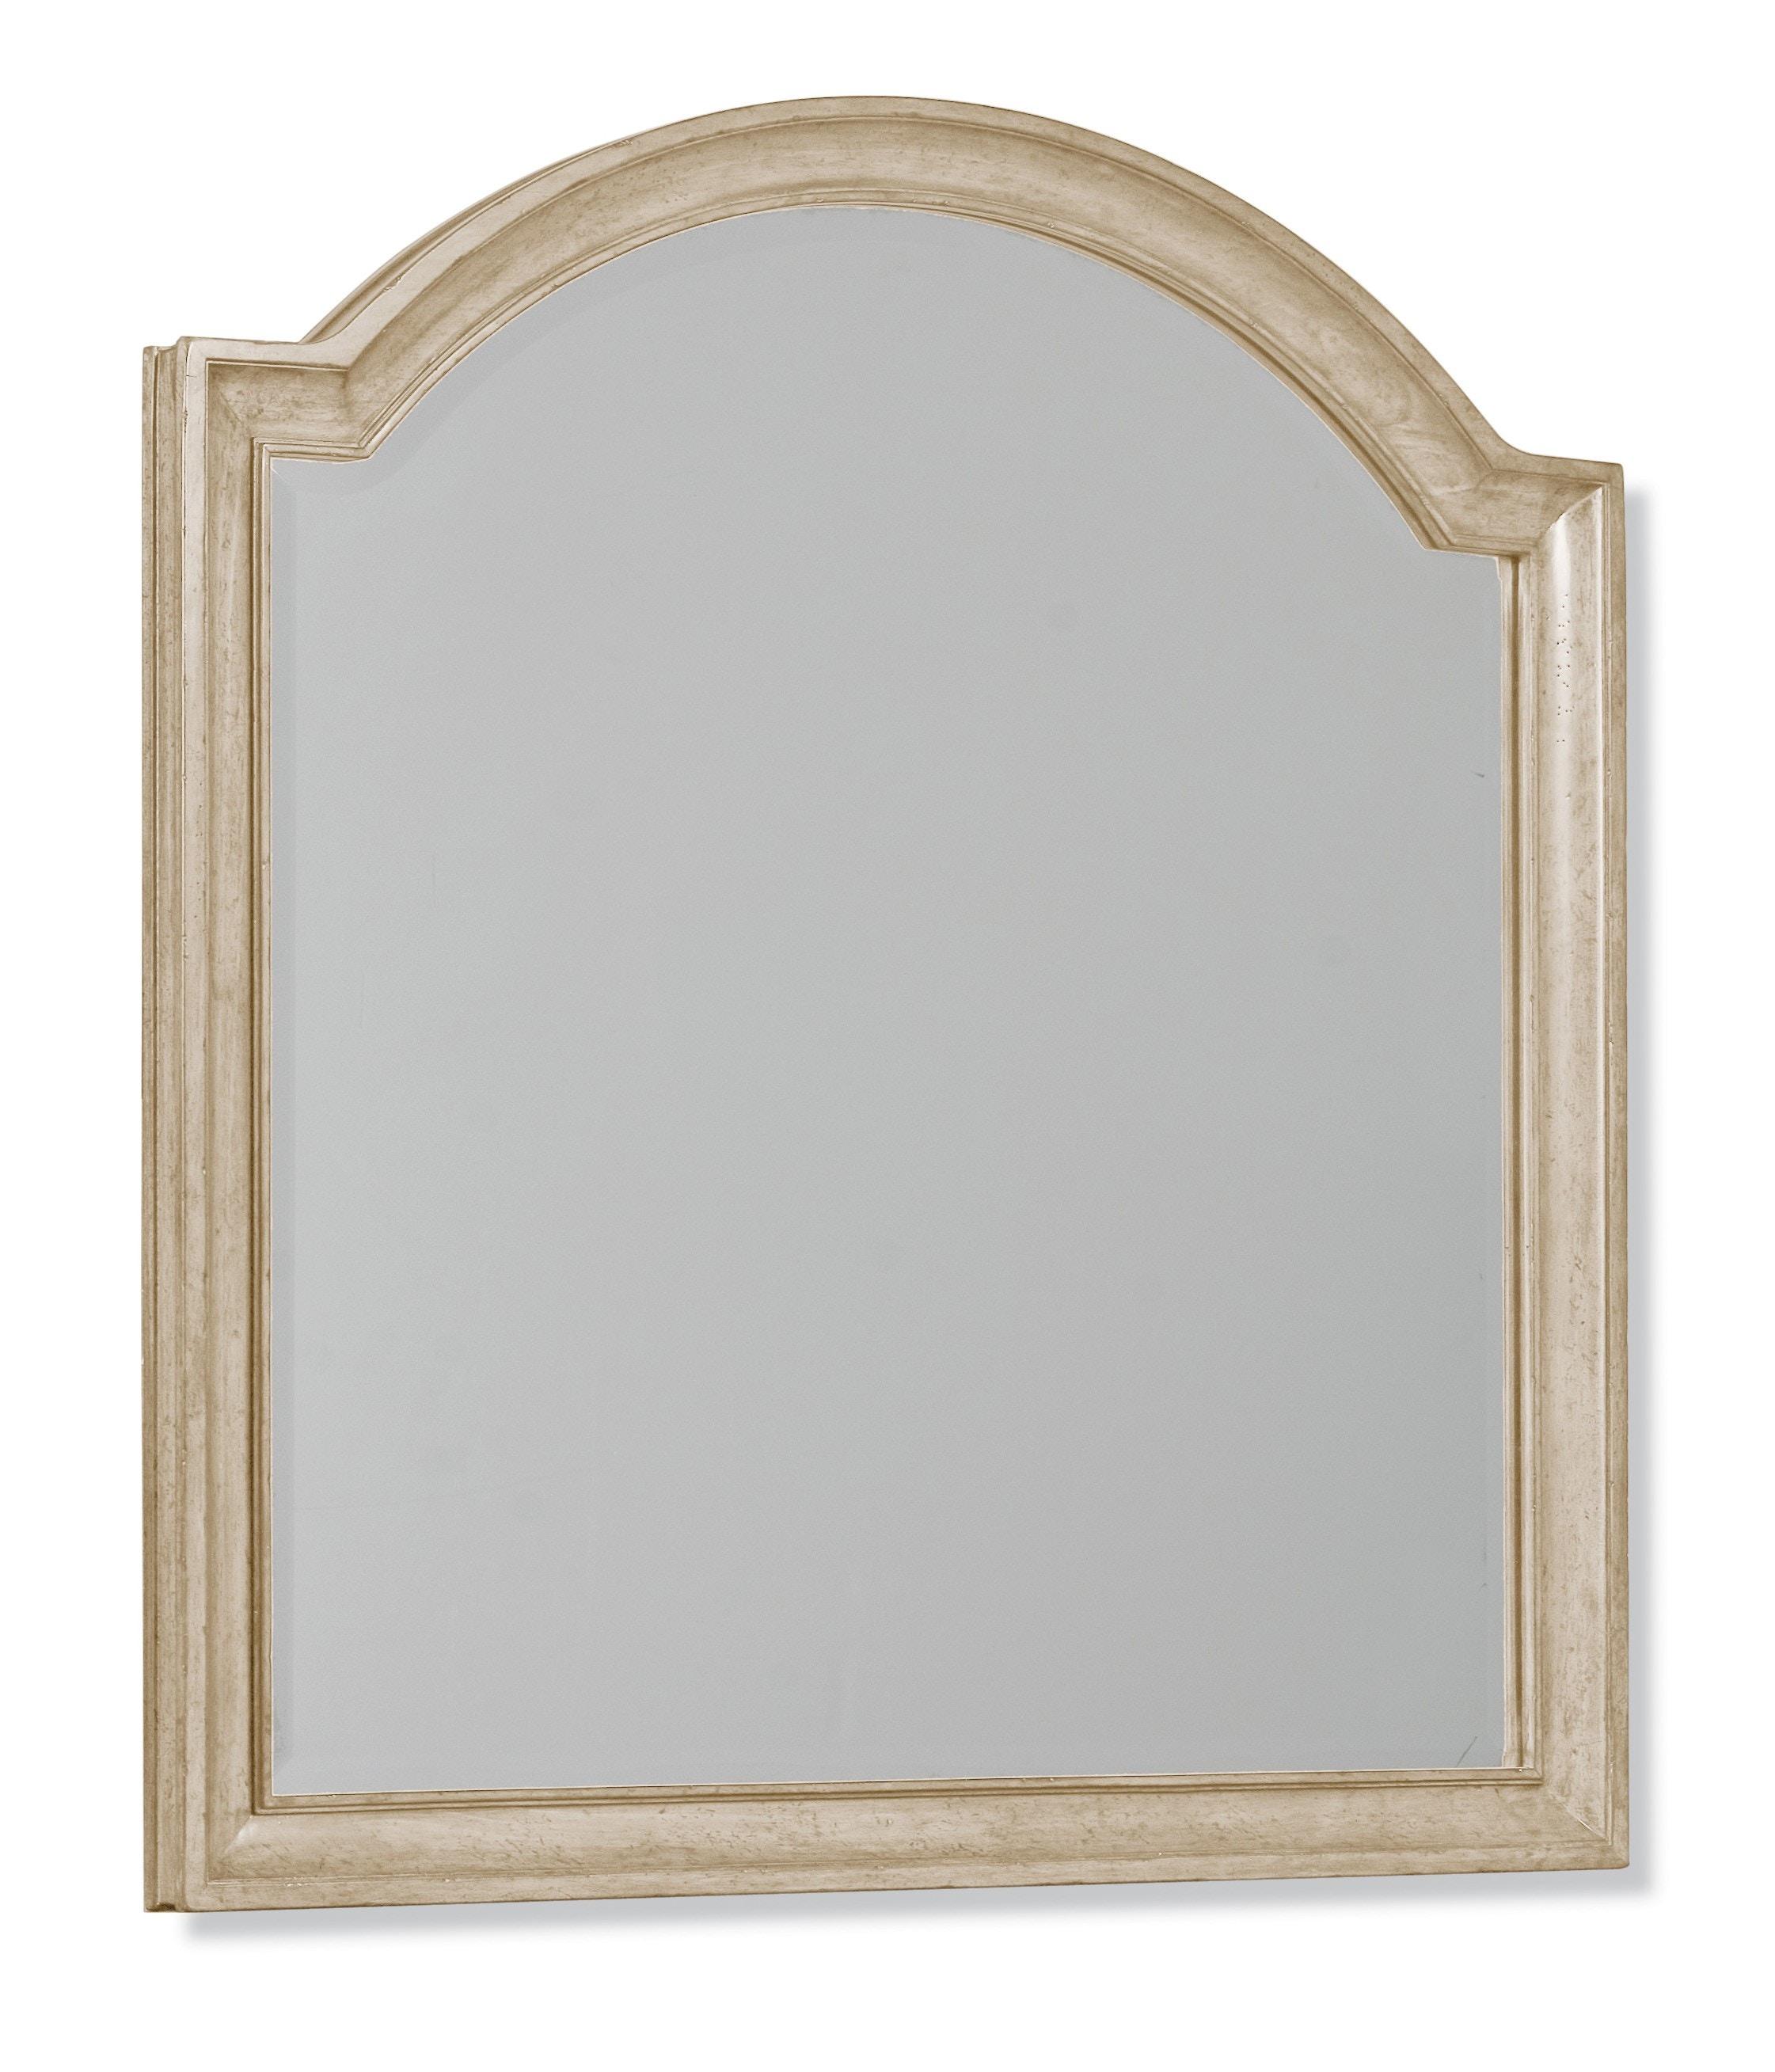 ART Furniture Provenance Vertical Mirror   Linen 176121 2617